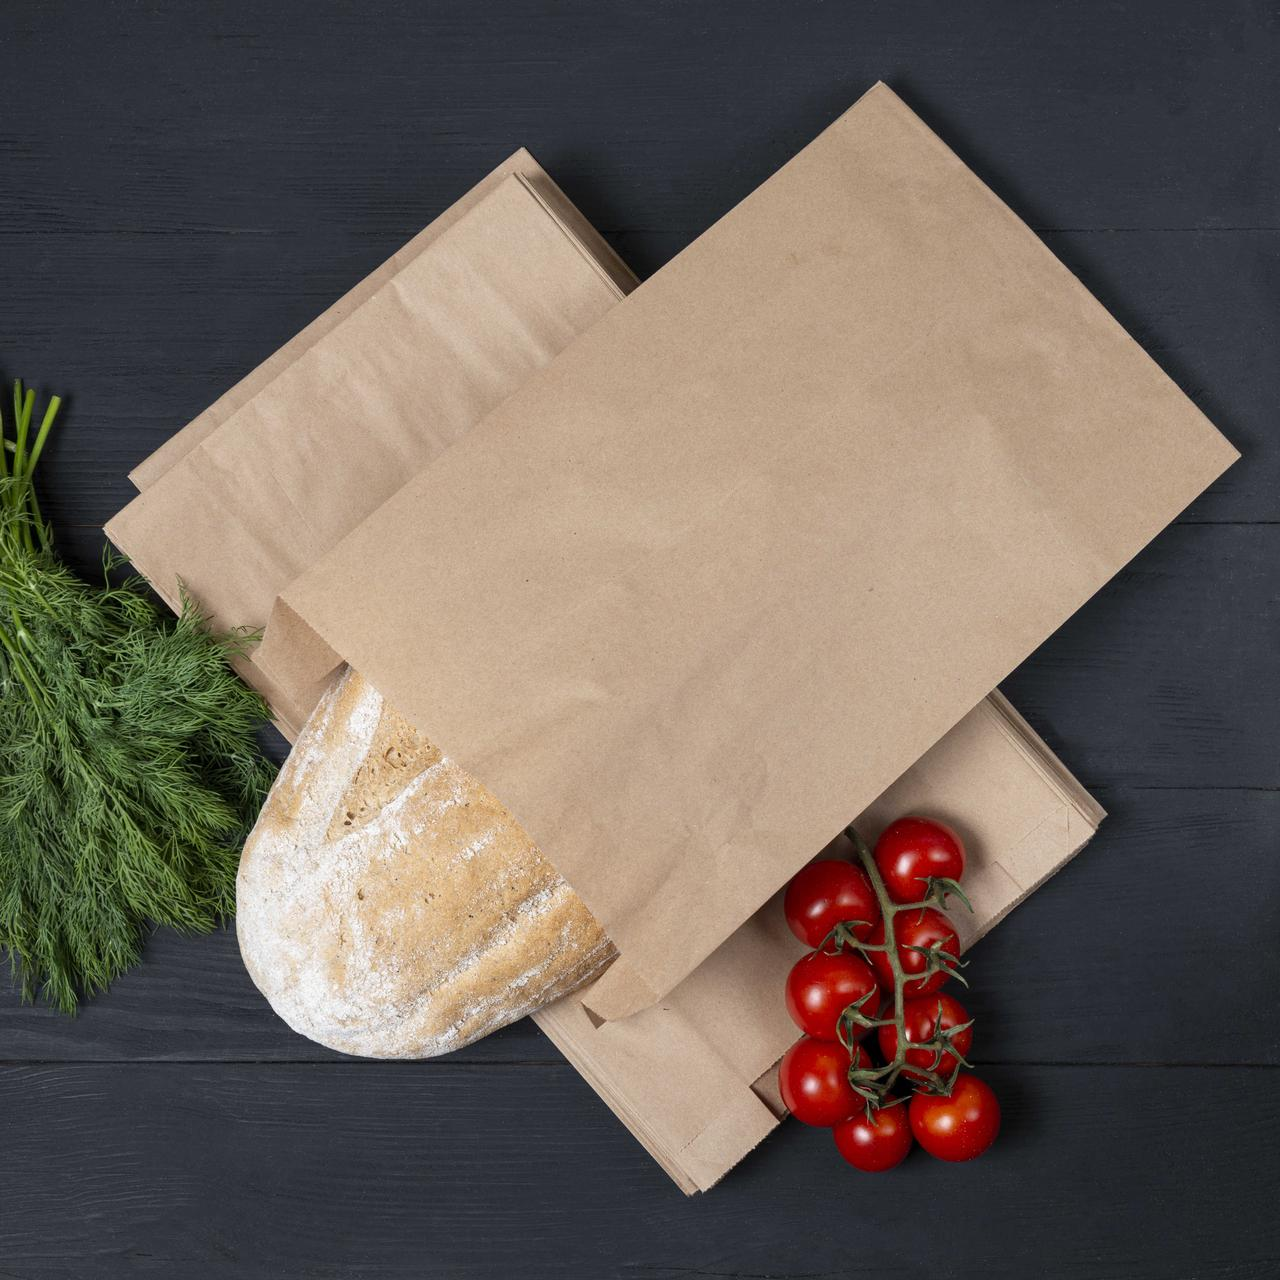 Паперовий крафт пакет саше 220*60*340 мм пакети паперові для фасування